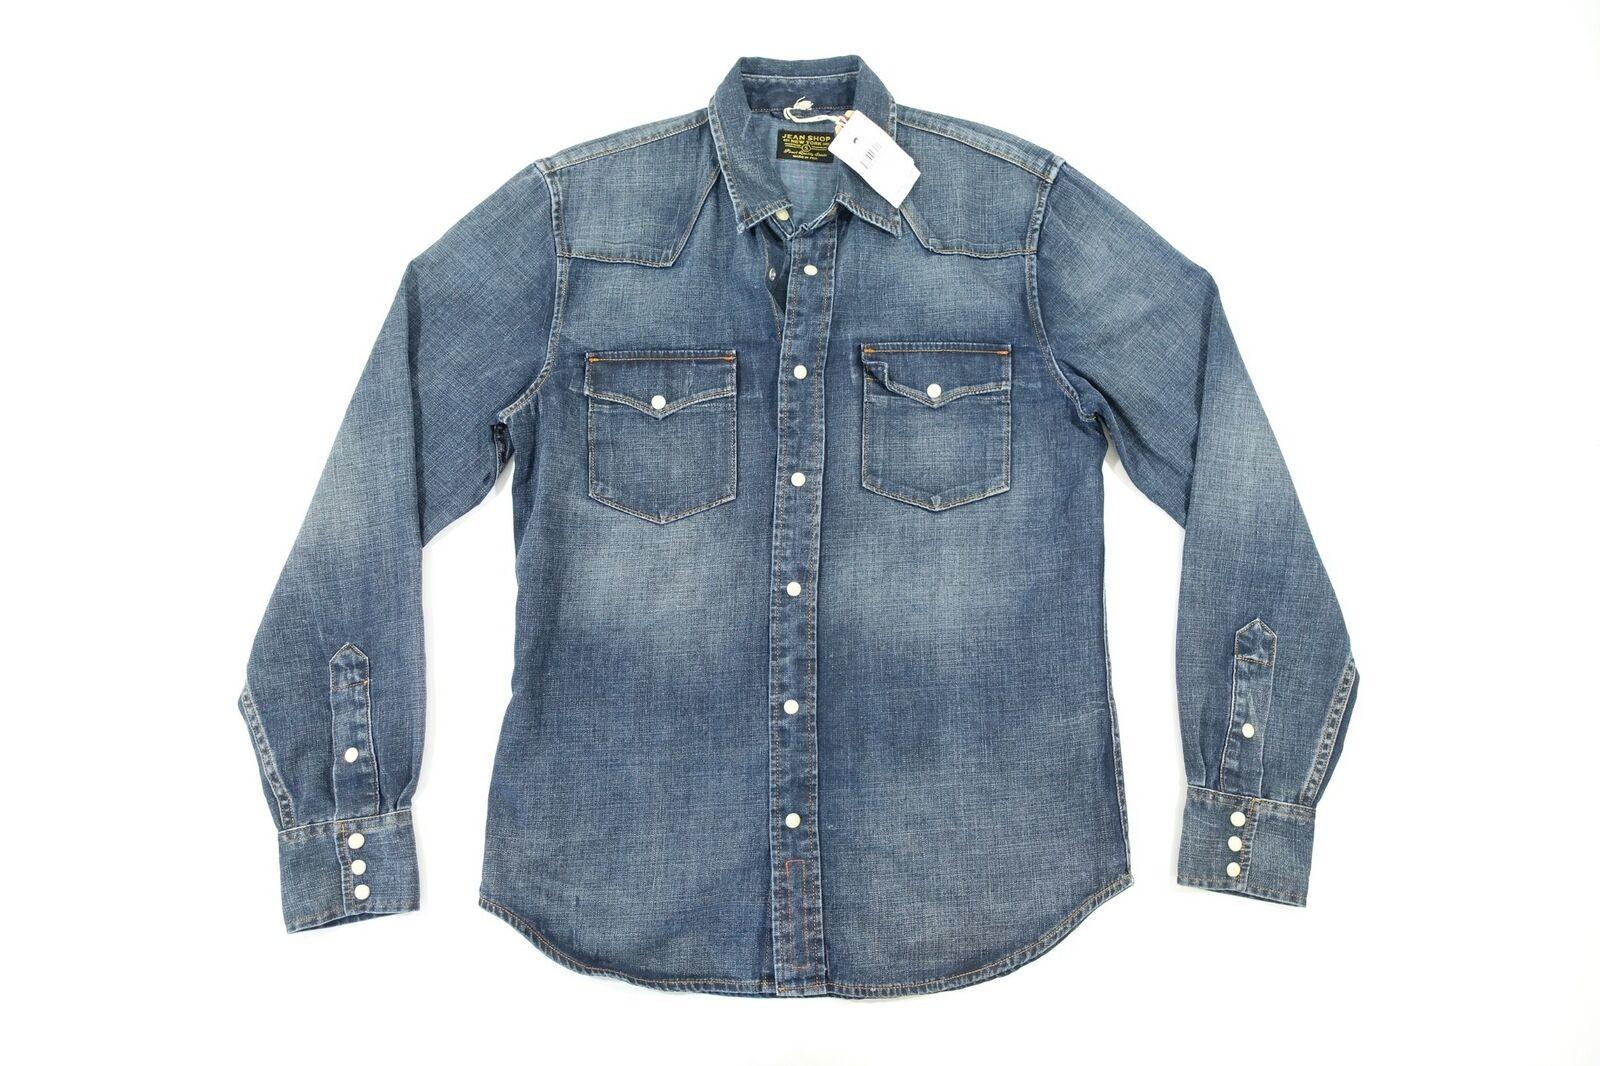 Jean Shop corona azul desColorido pequeño vaquero occidental camisa  delantera botón SNAP  primera vez respuesta